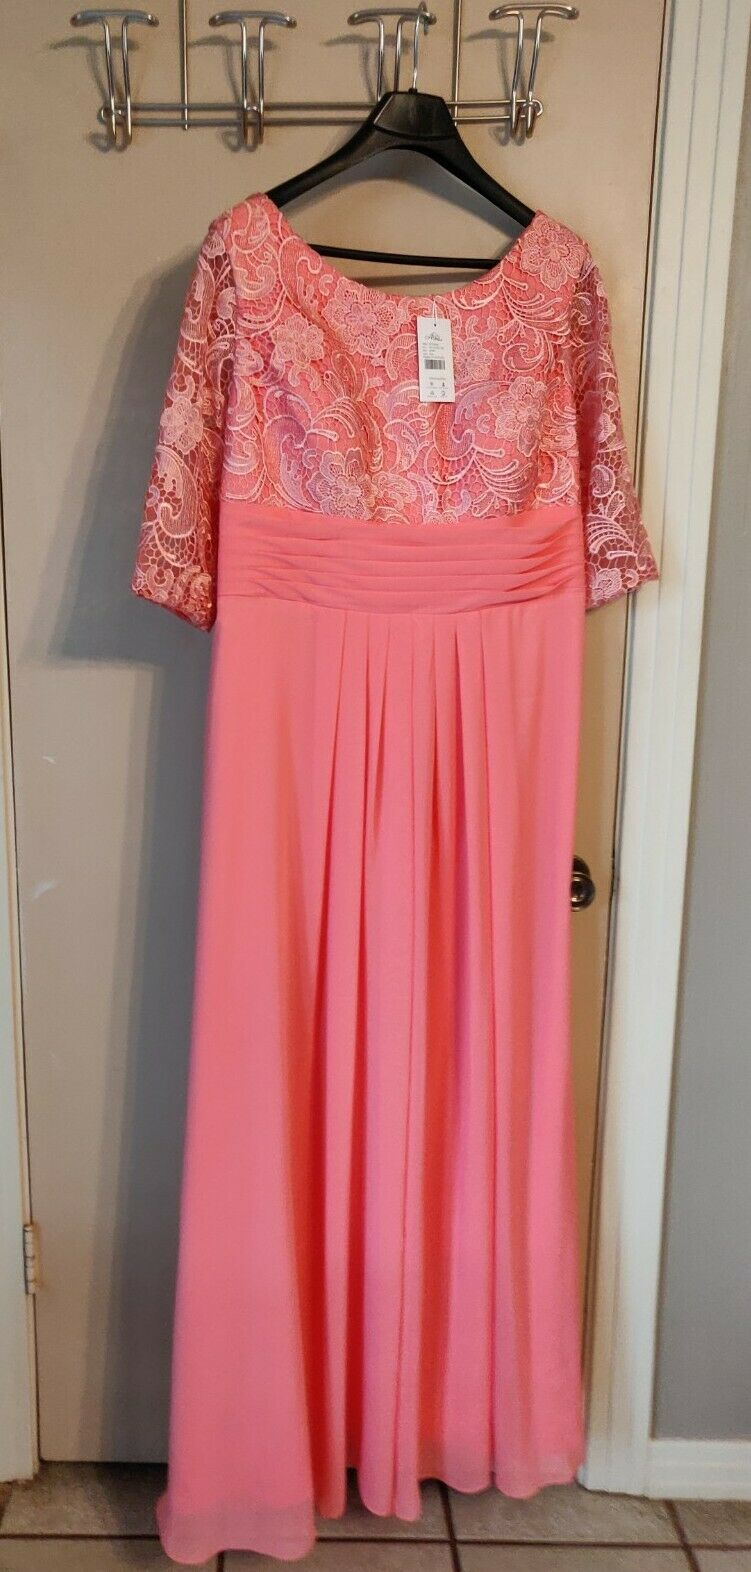 damen Bridal Attire Größe 18W Coral Long Dress Zaxants